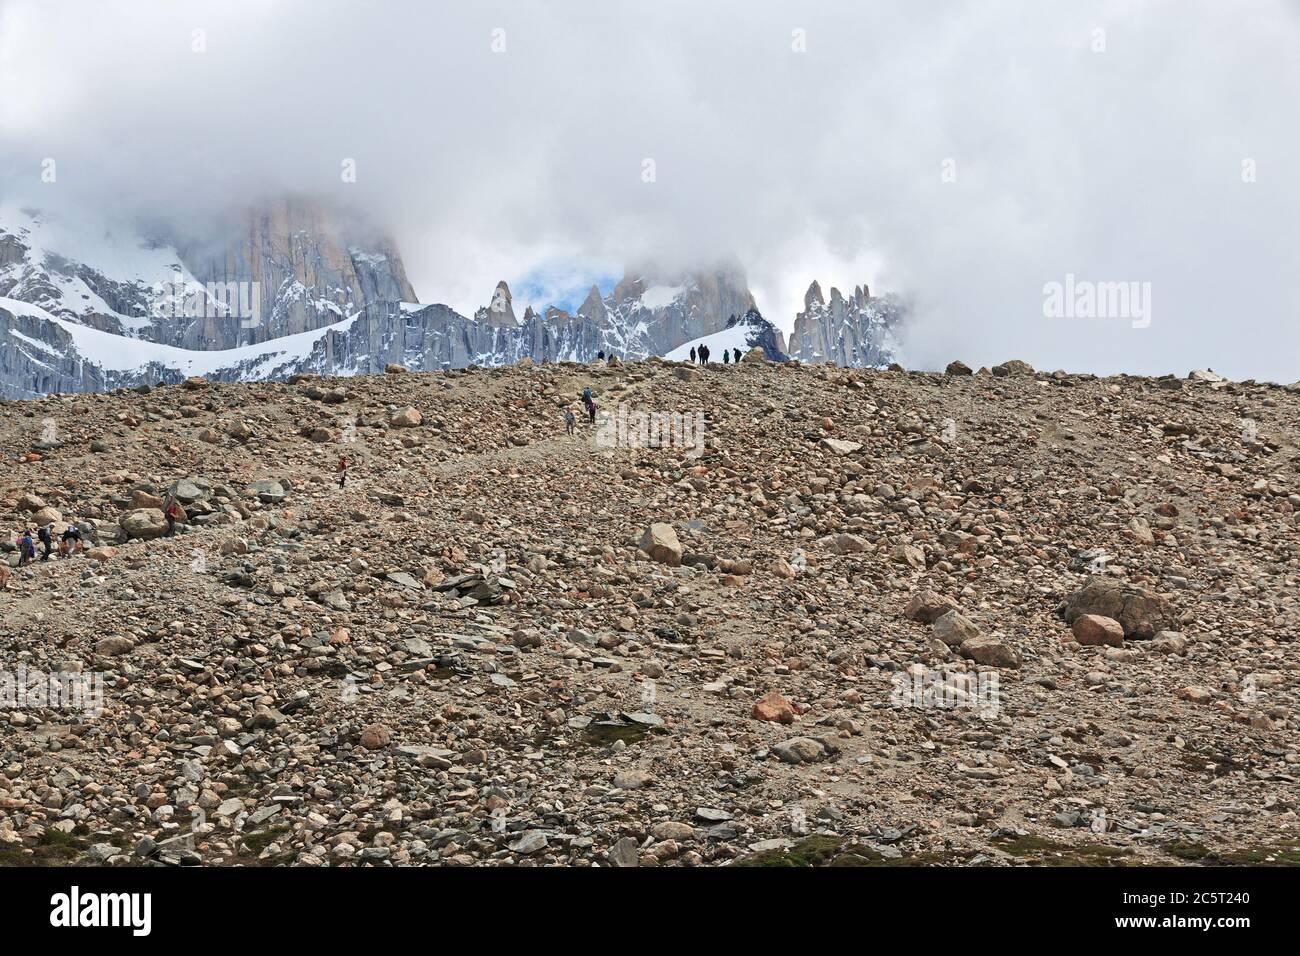 Trekking to Fitz Roy, El Chalten, Patagonia, Argentina Stock Photo